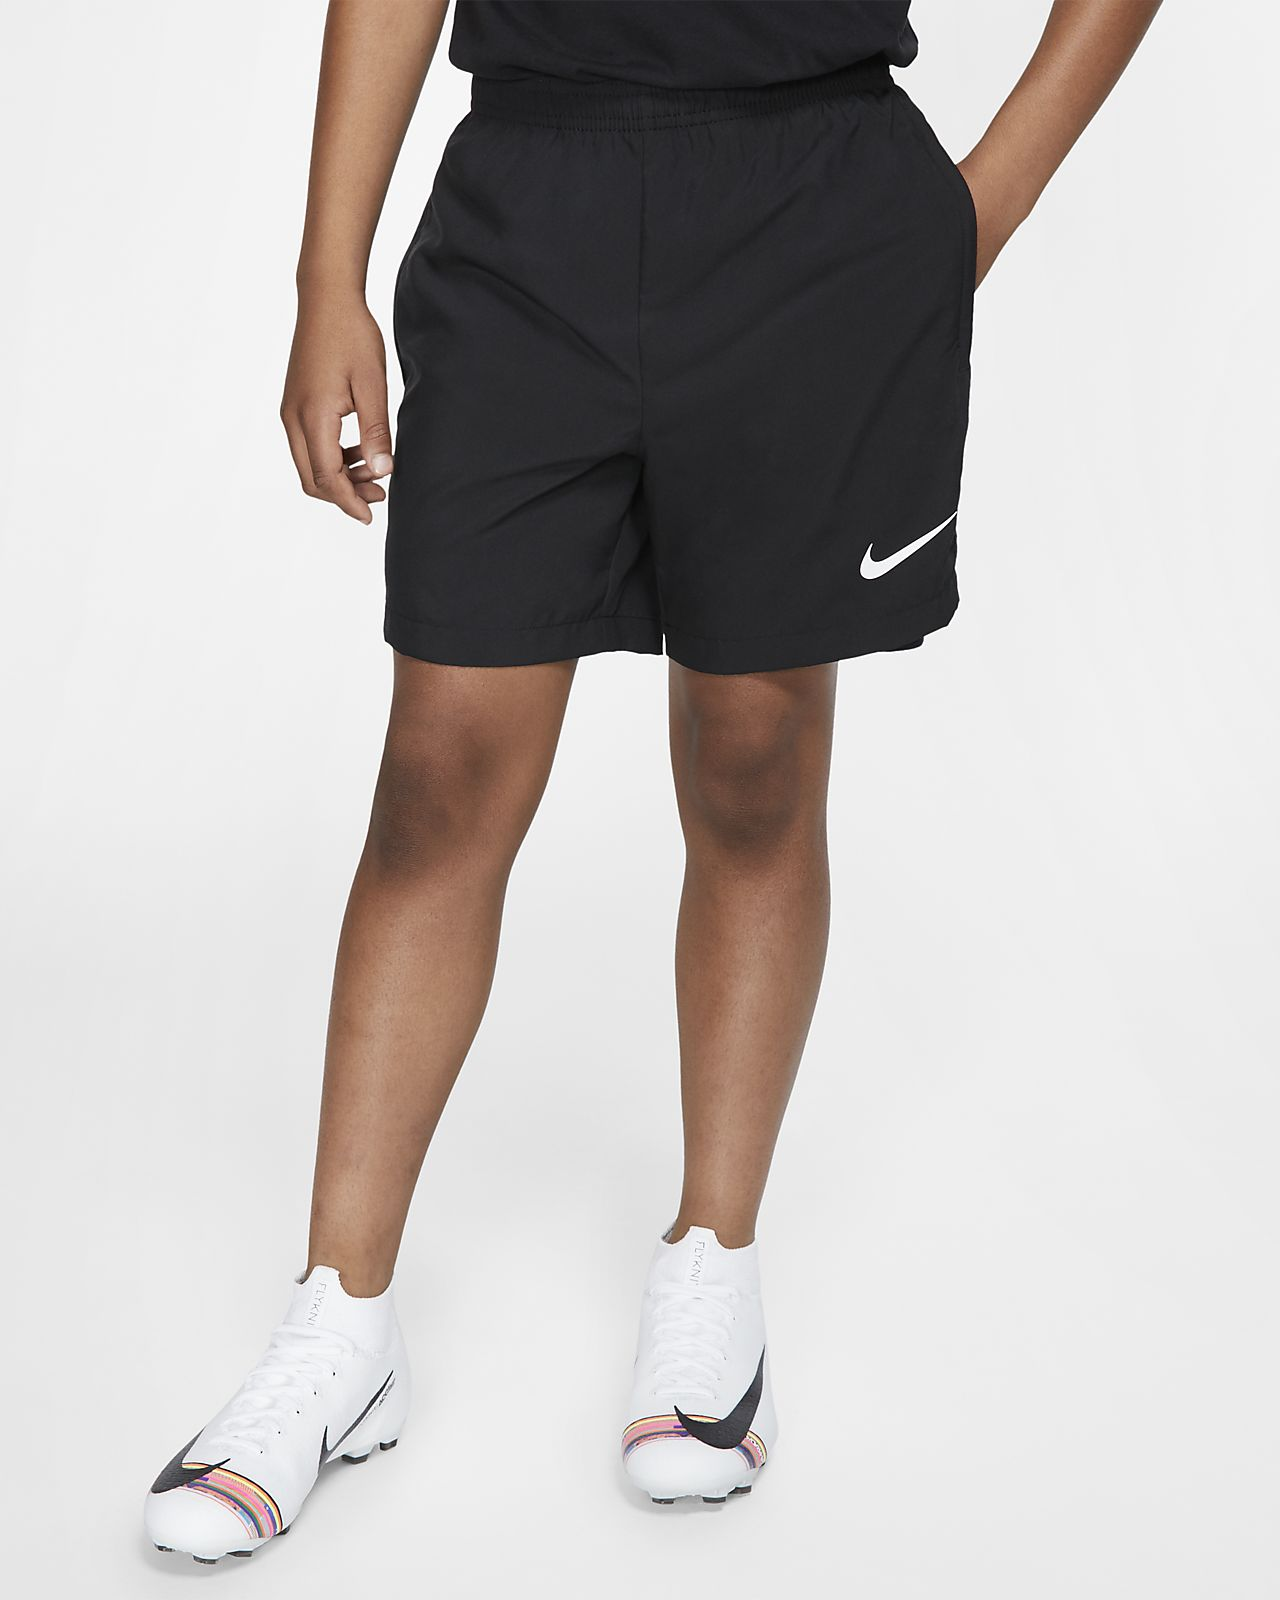 Nike Dri-FIT Mercurial fotballshorts til store barn